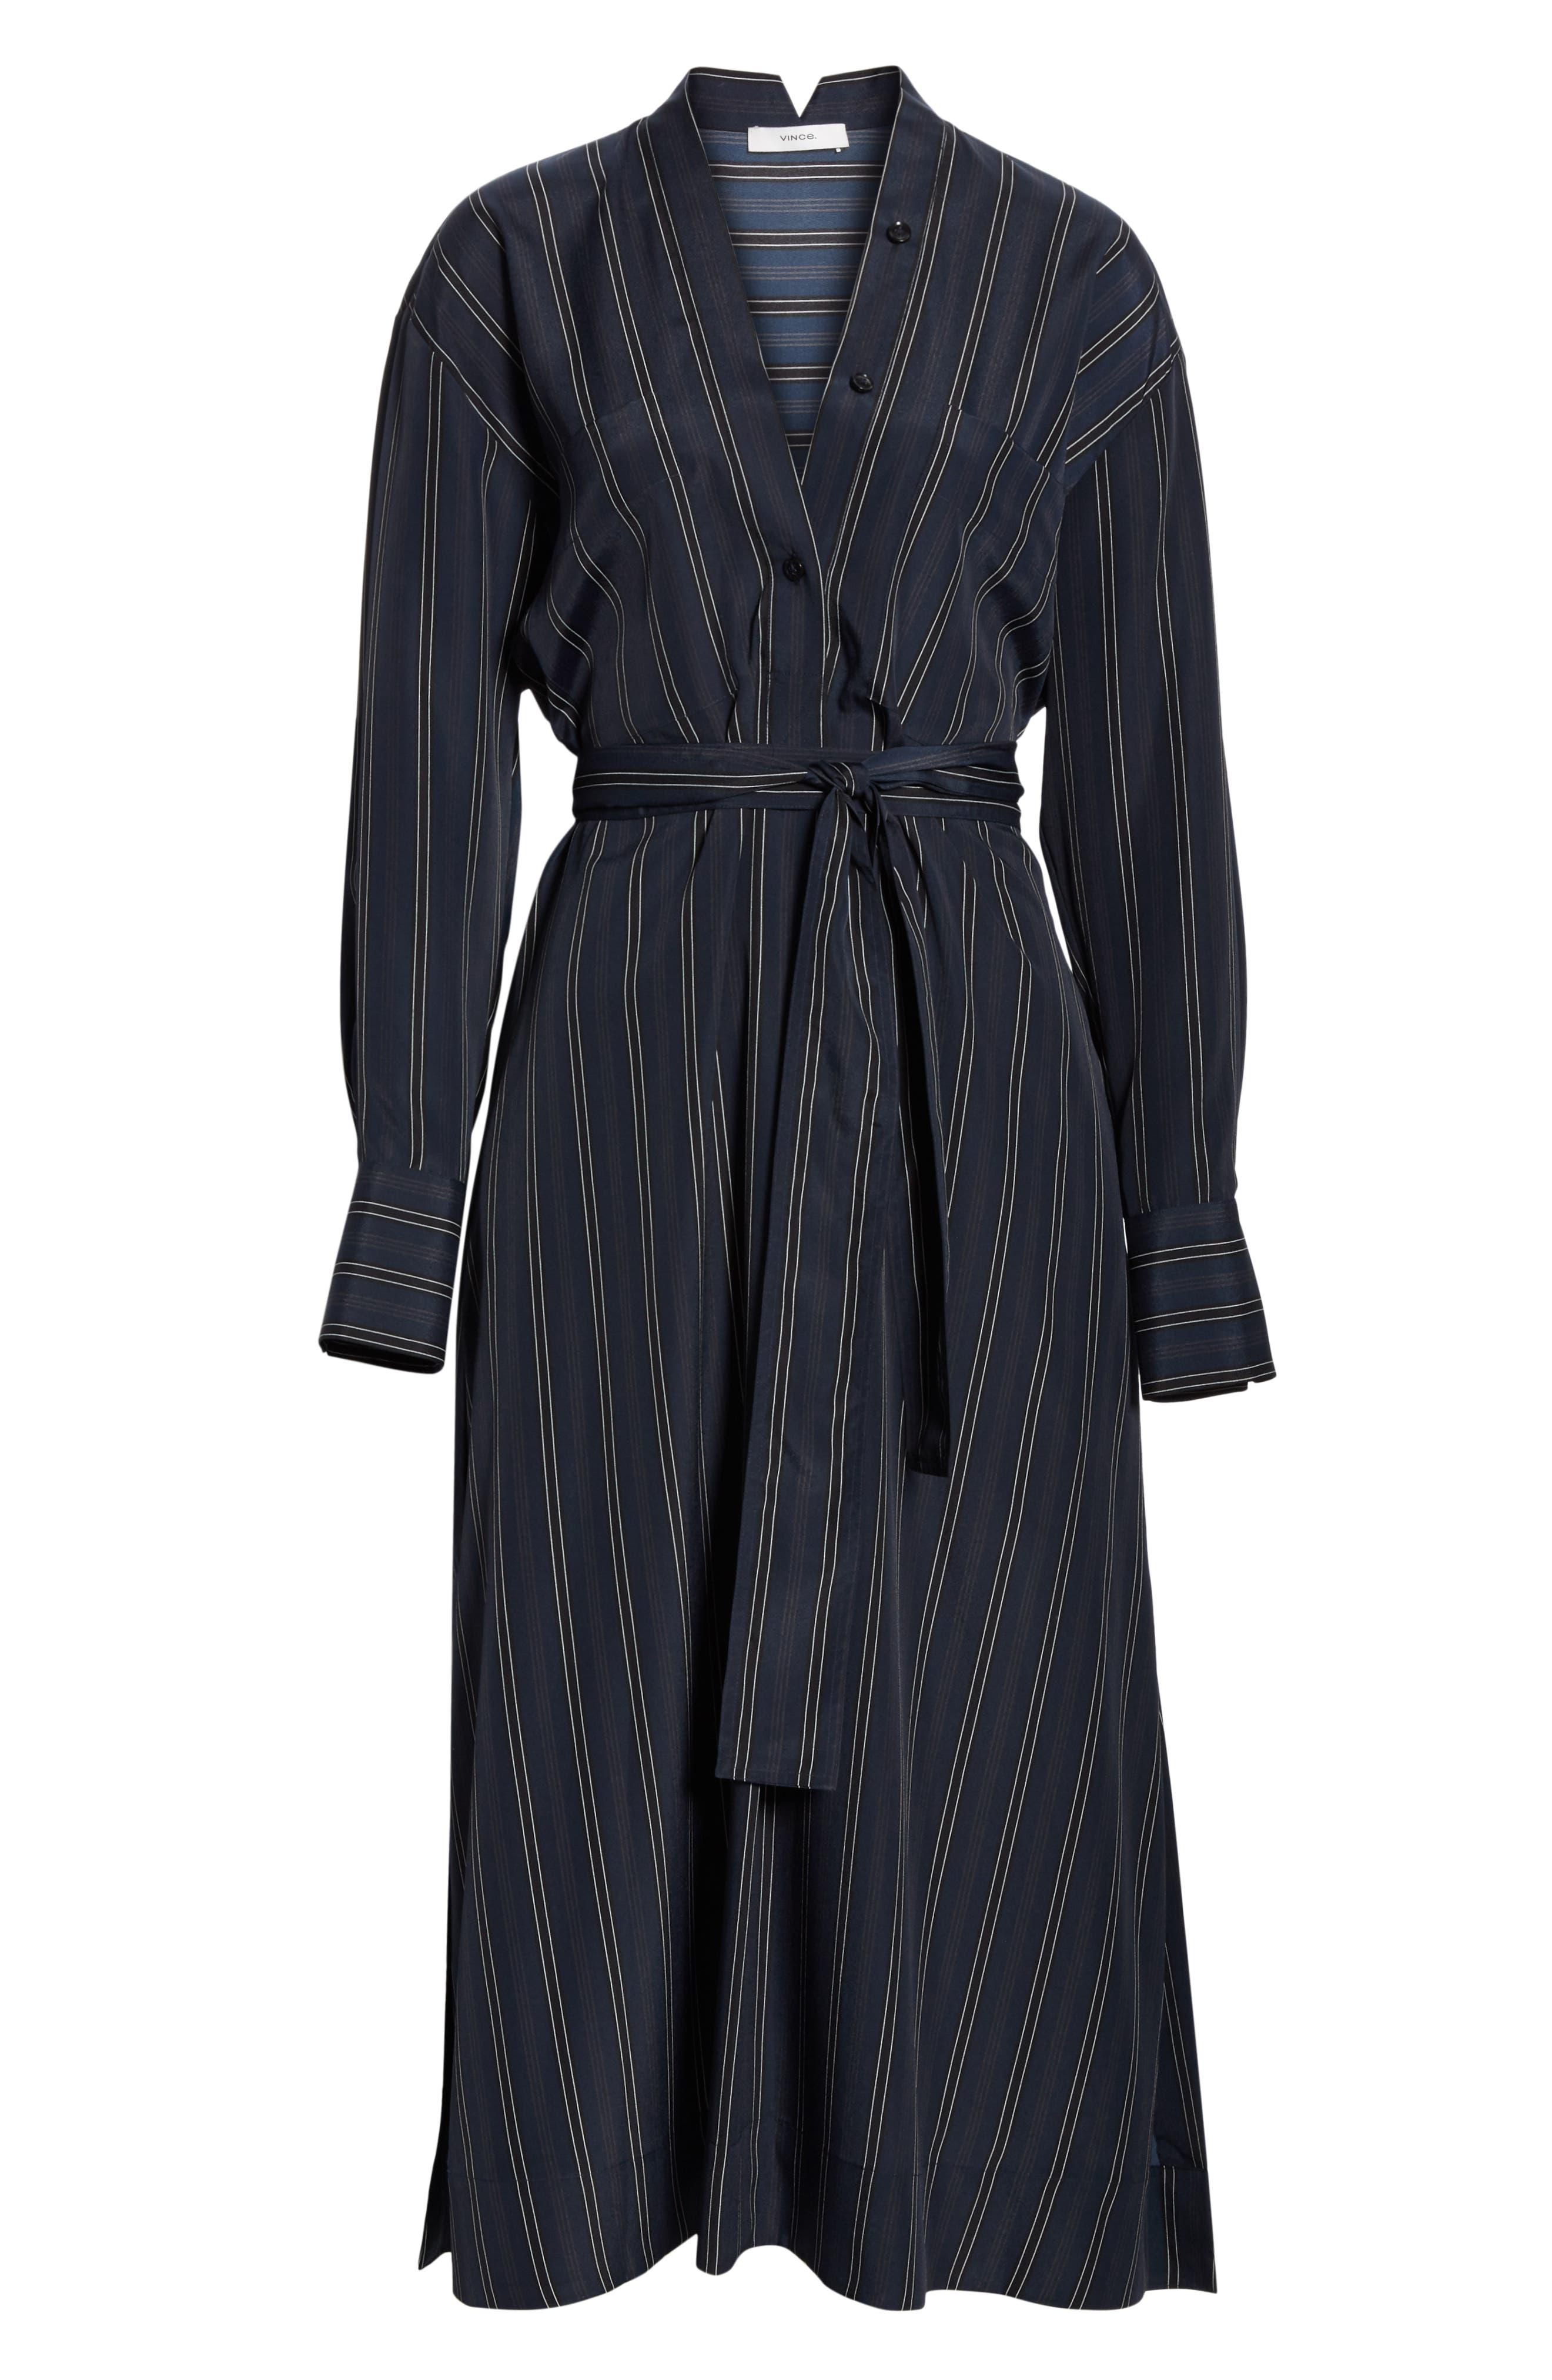 VINCE, Stripe Belted Midi Shirtdress, Alternate thumbnail 7, color, MARINE